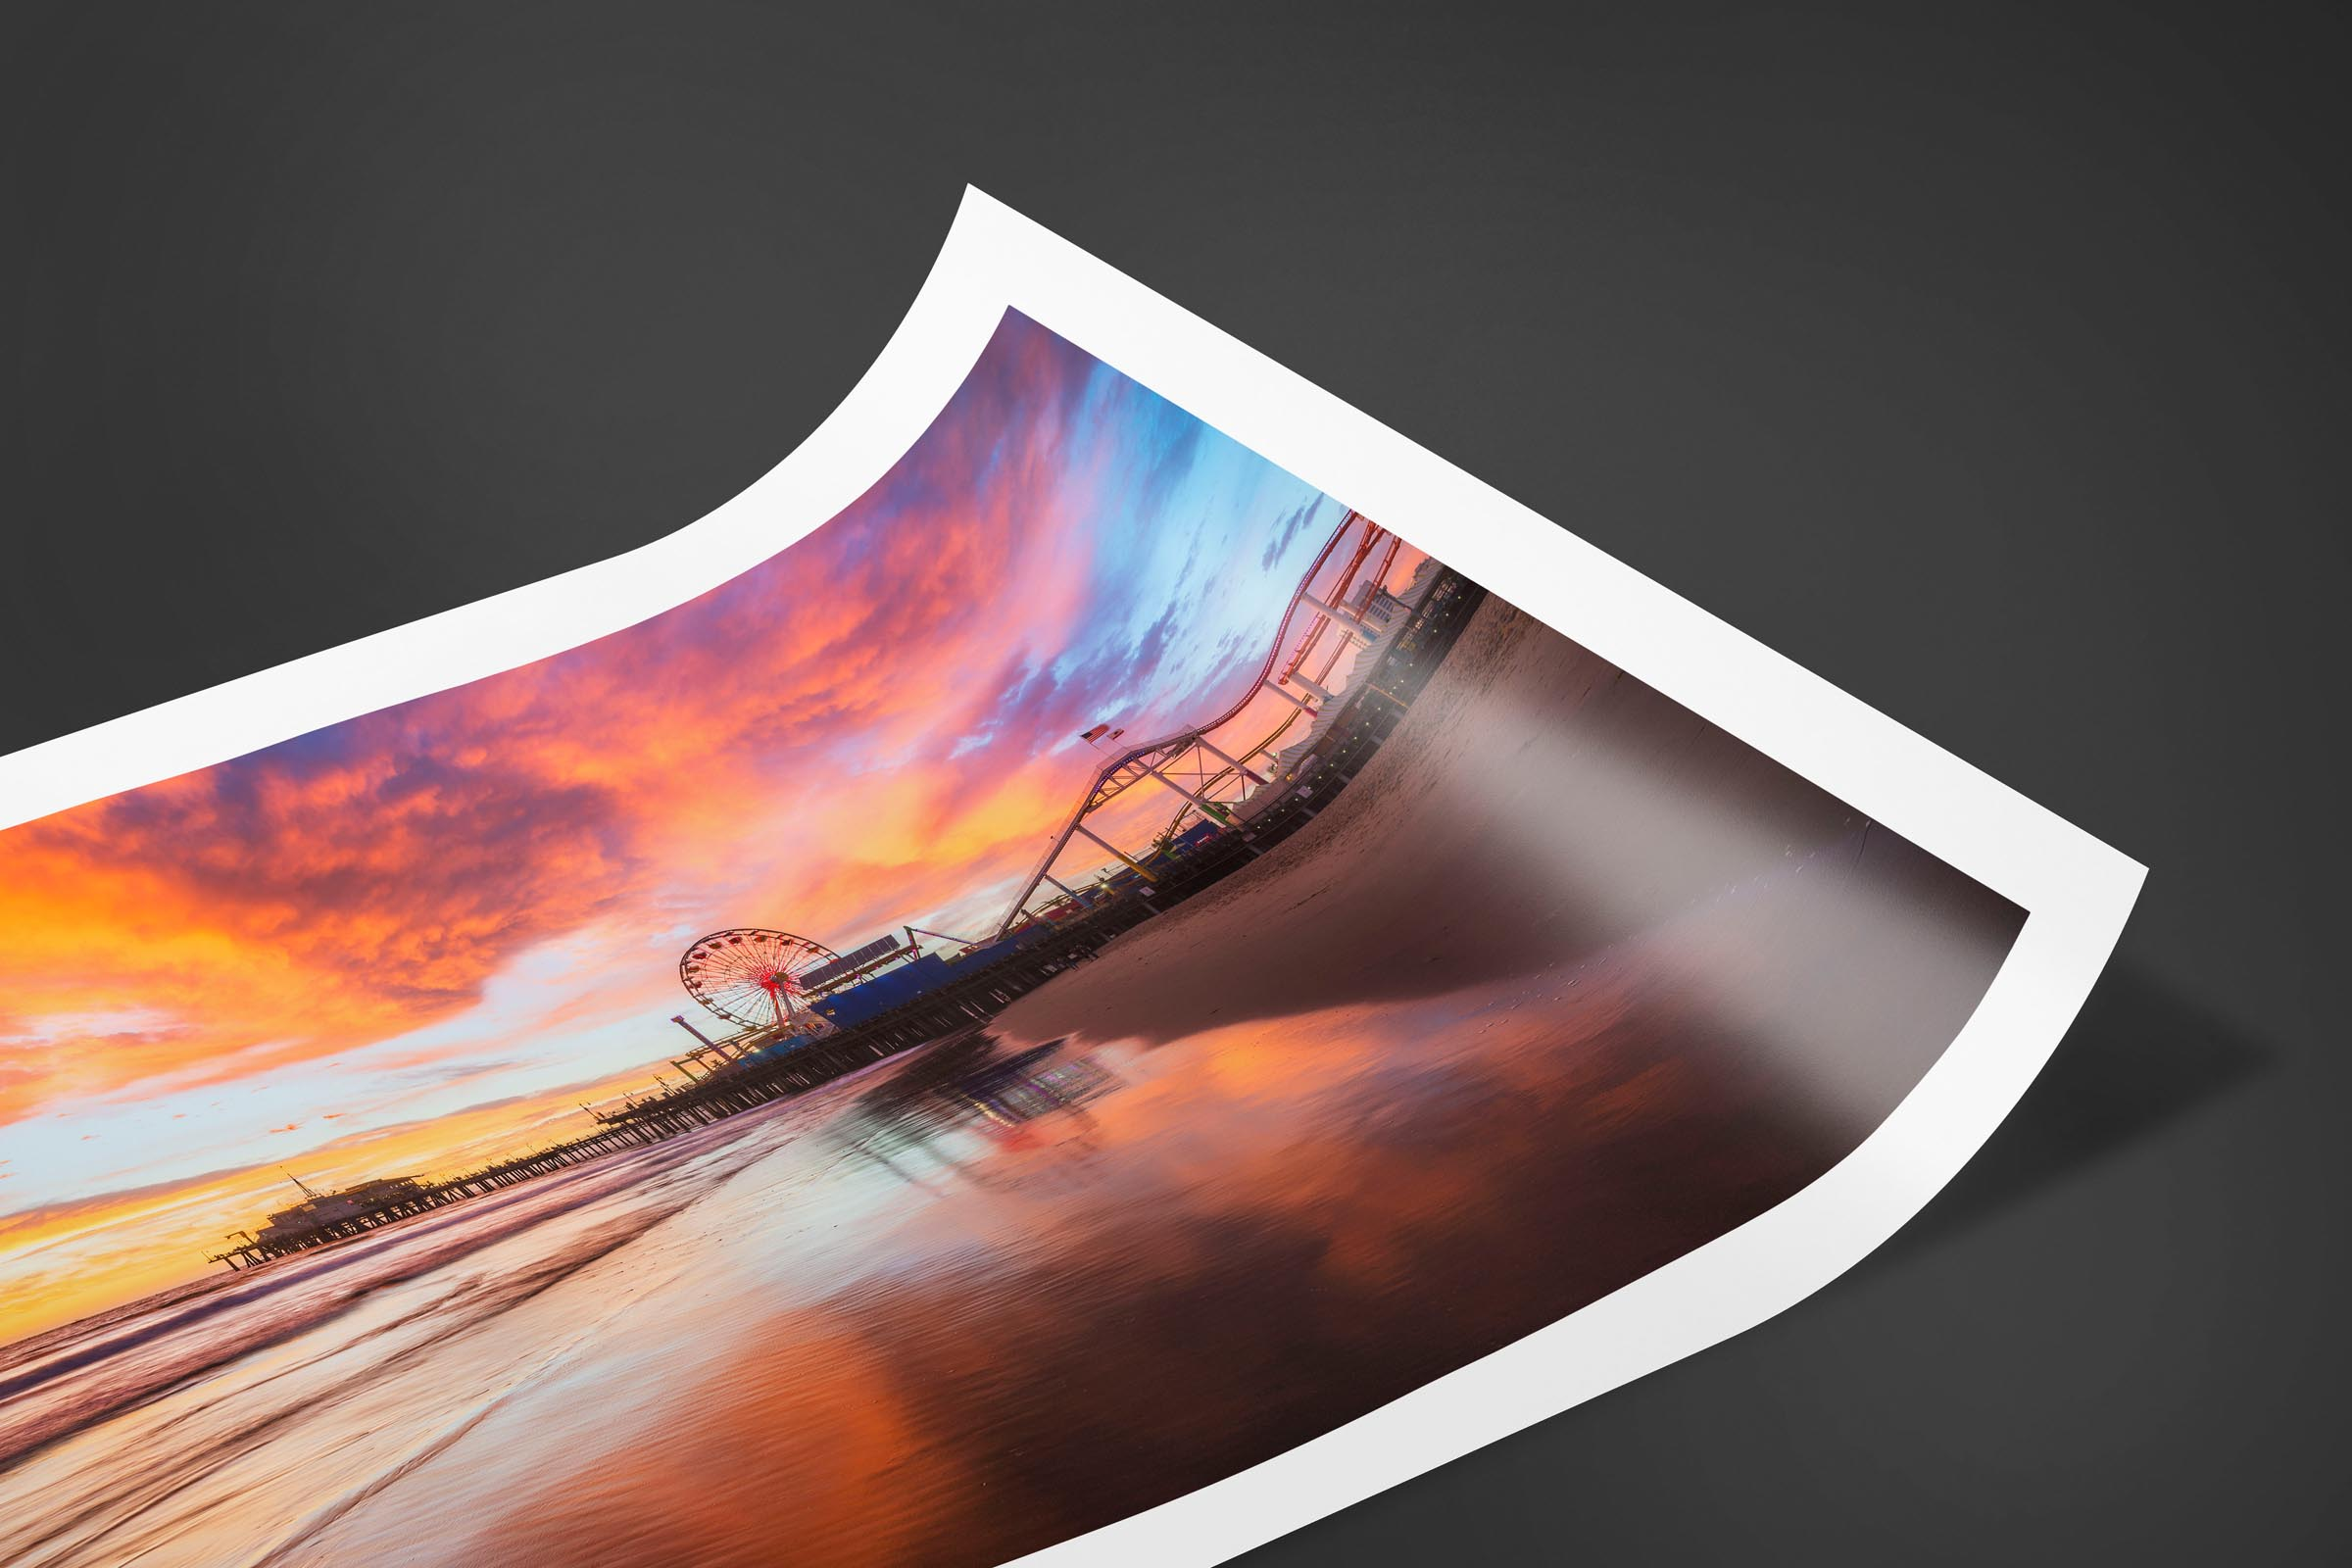 Fine art limited edition print of Santa Monica Pier in Santa Monica, California by Brent Goldman Photography